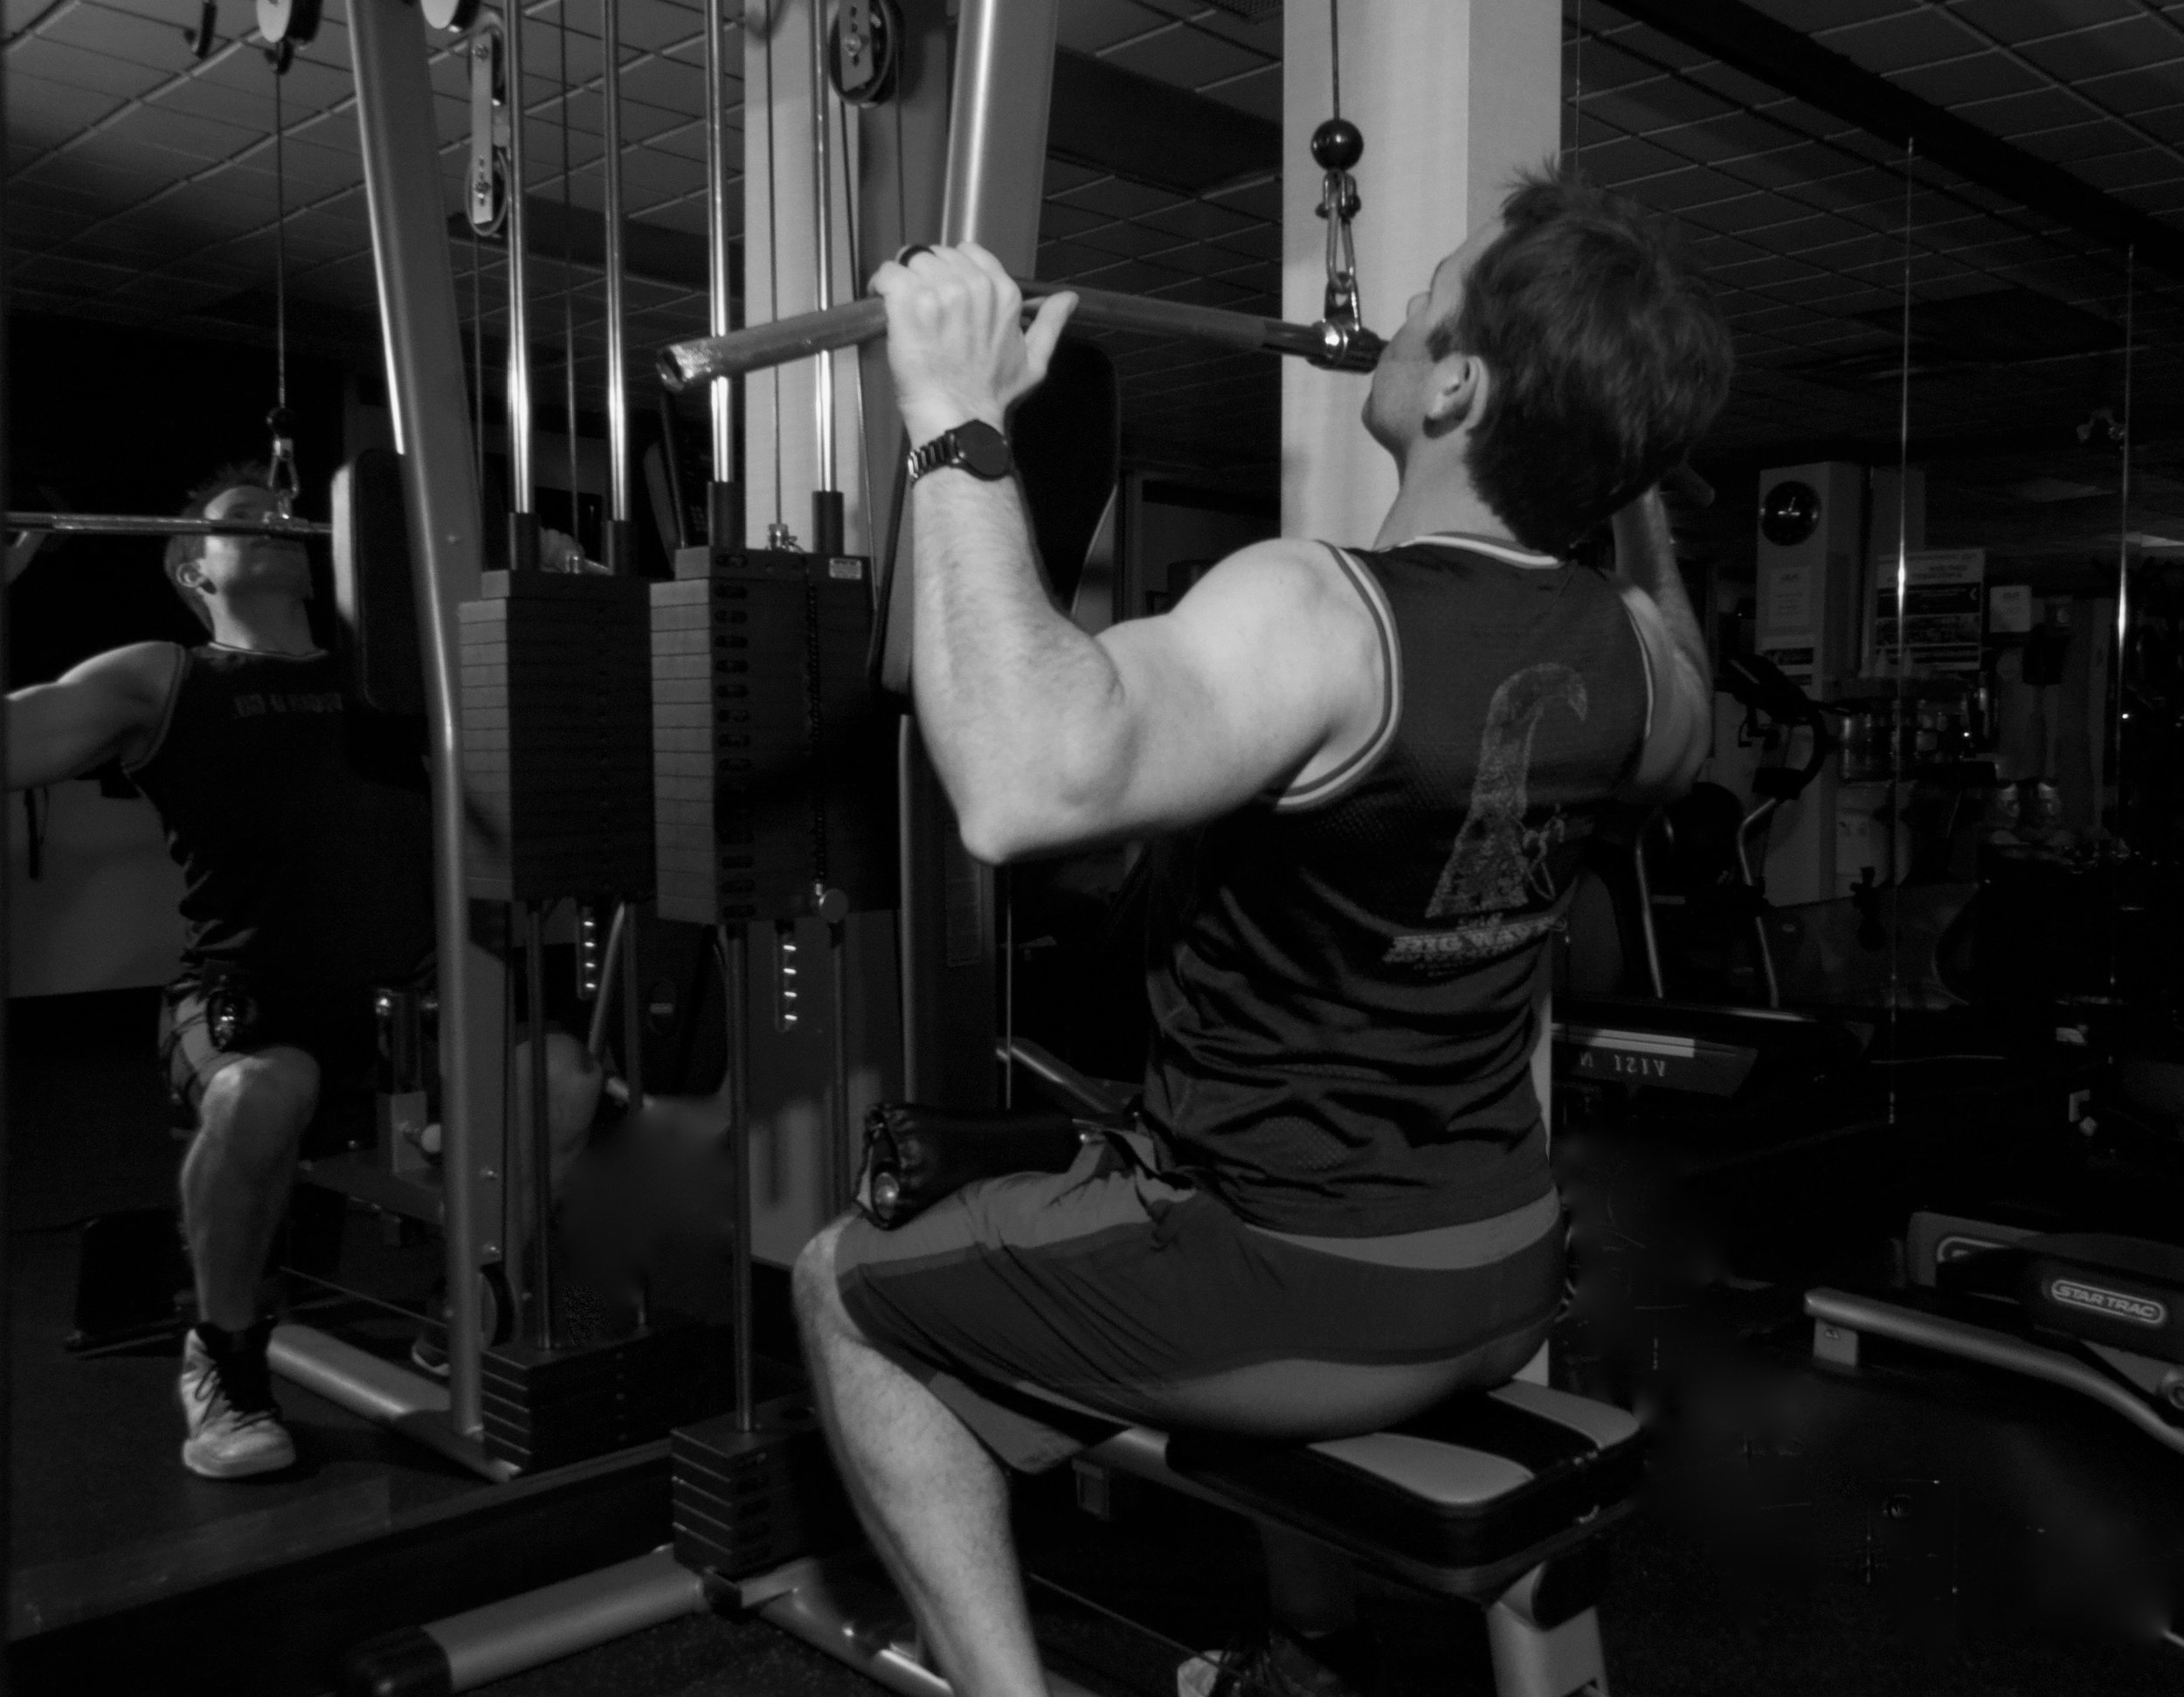 Alistair Hopper Flex Fitness Lat Pull Down 2.jpg